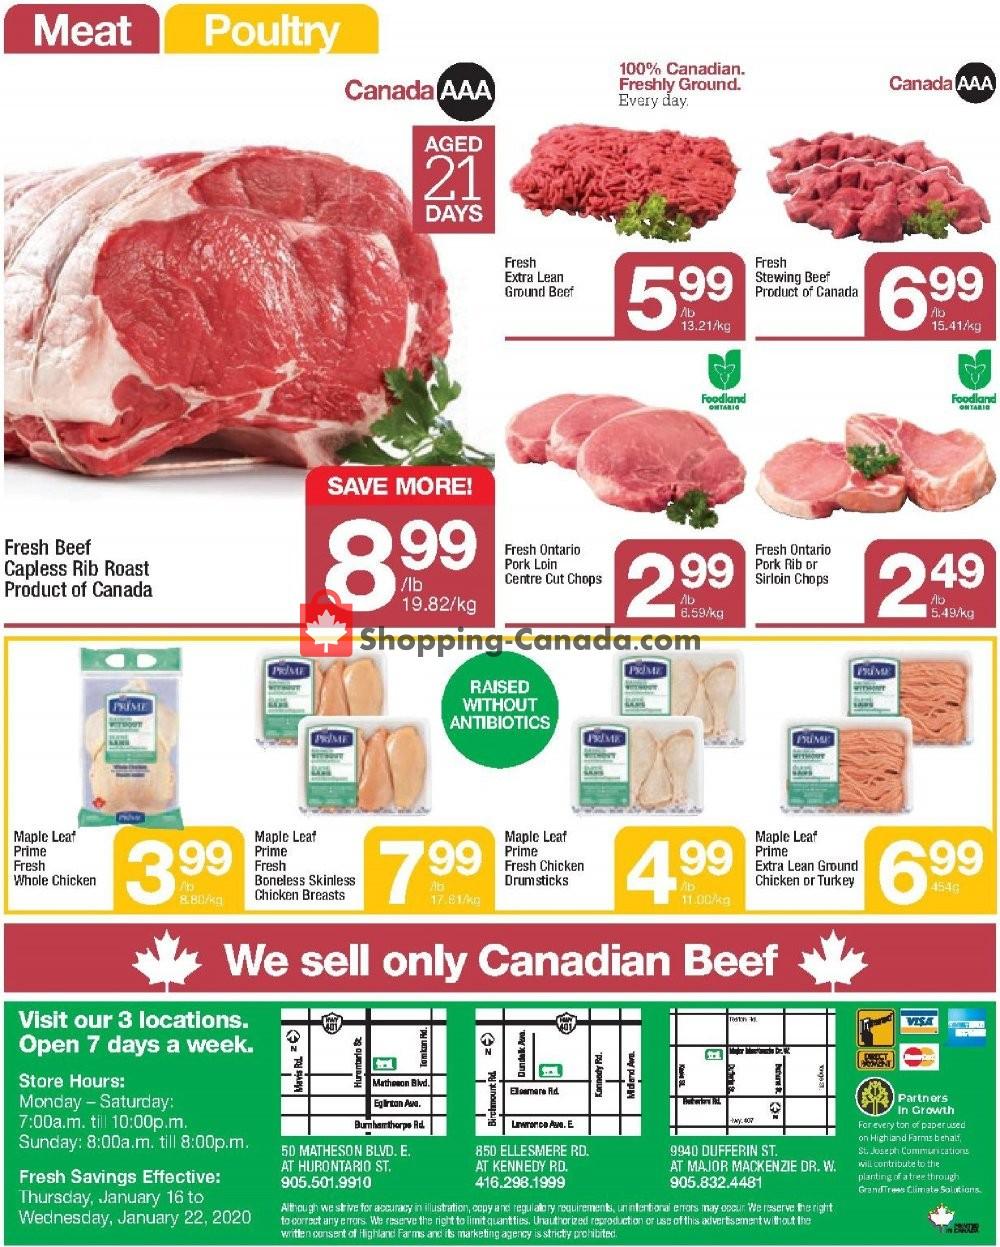 Flyer Highland Farms Canada - from Thursday January 16, 2020 to Wednesday January 22, 2020